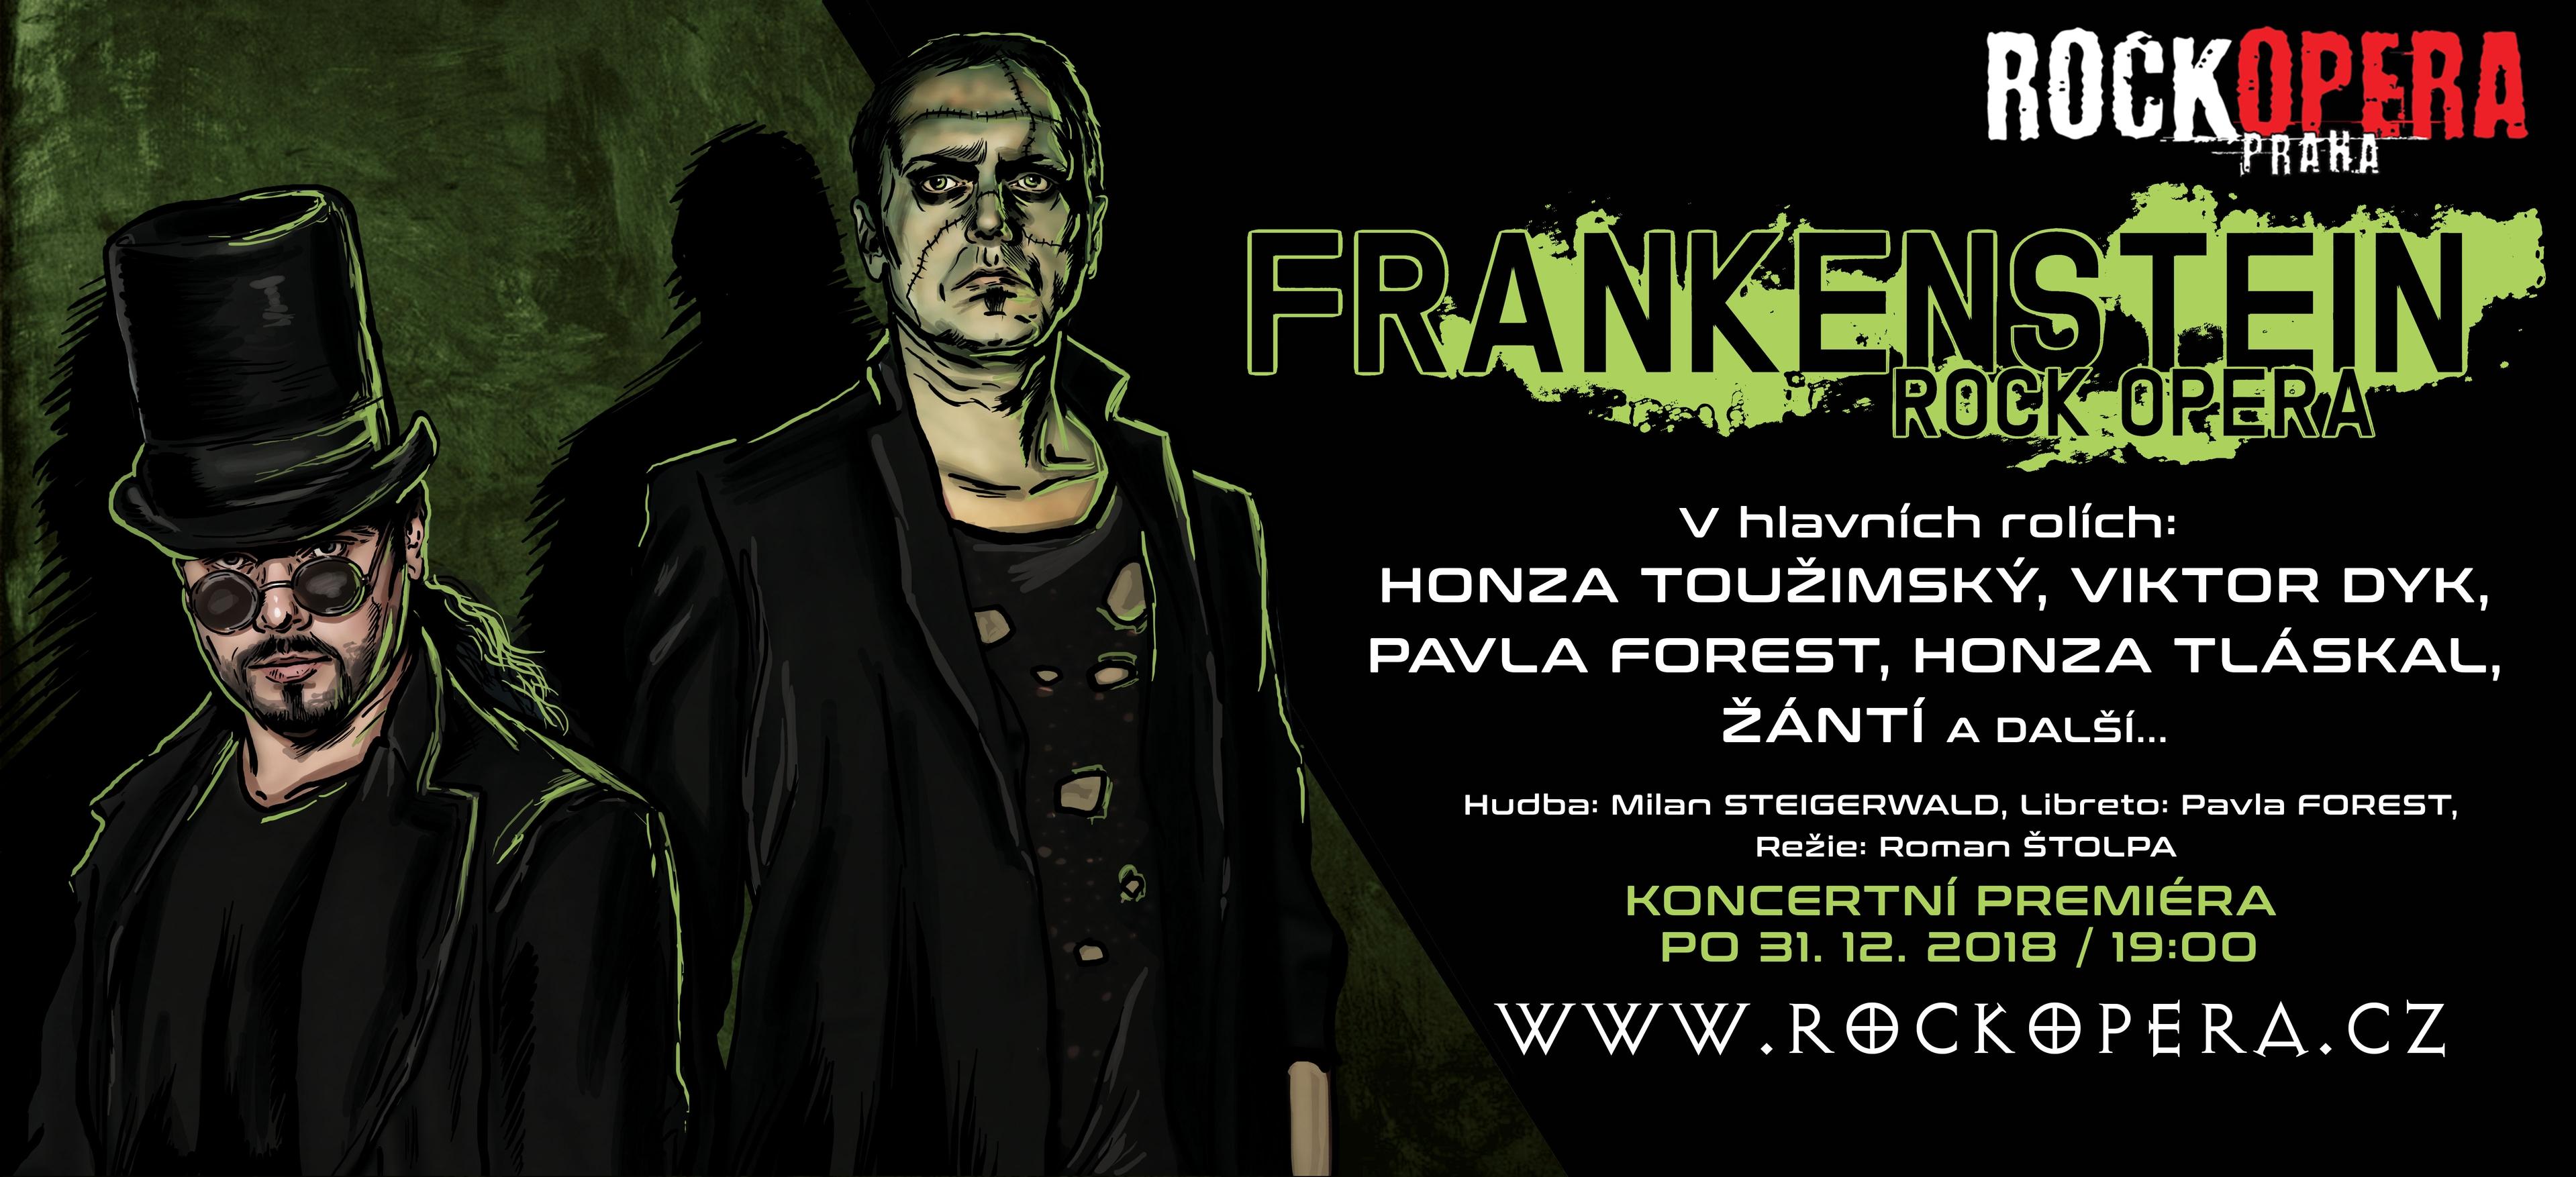 RockOpera Praha uvede na Silvestra šokujícího Frankensteina!